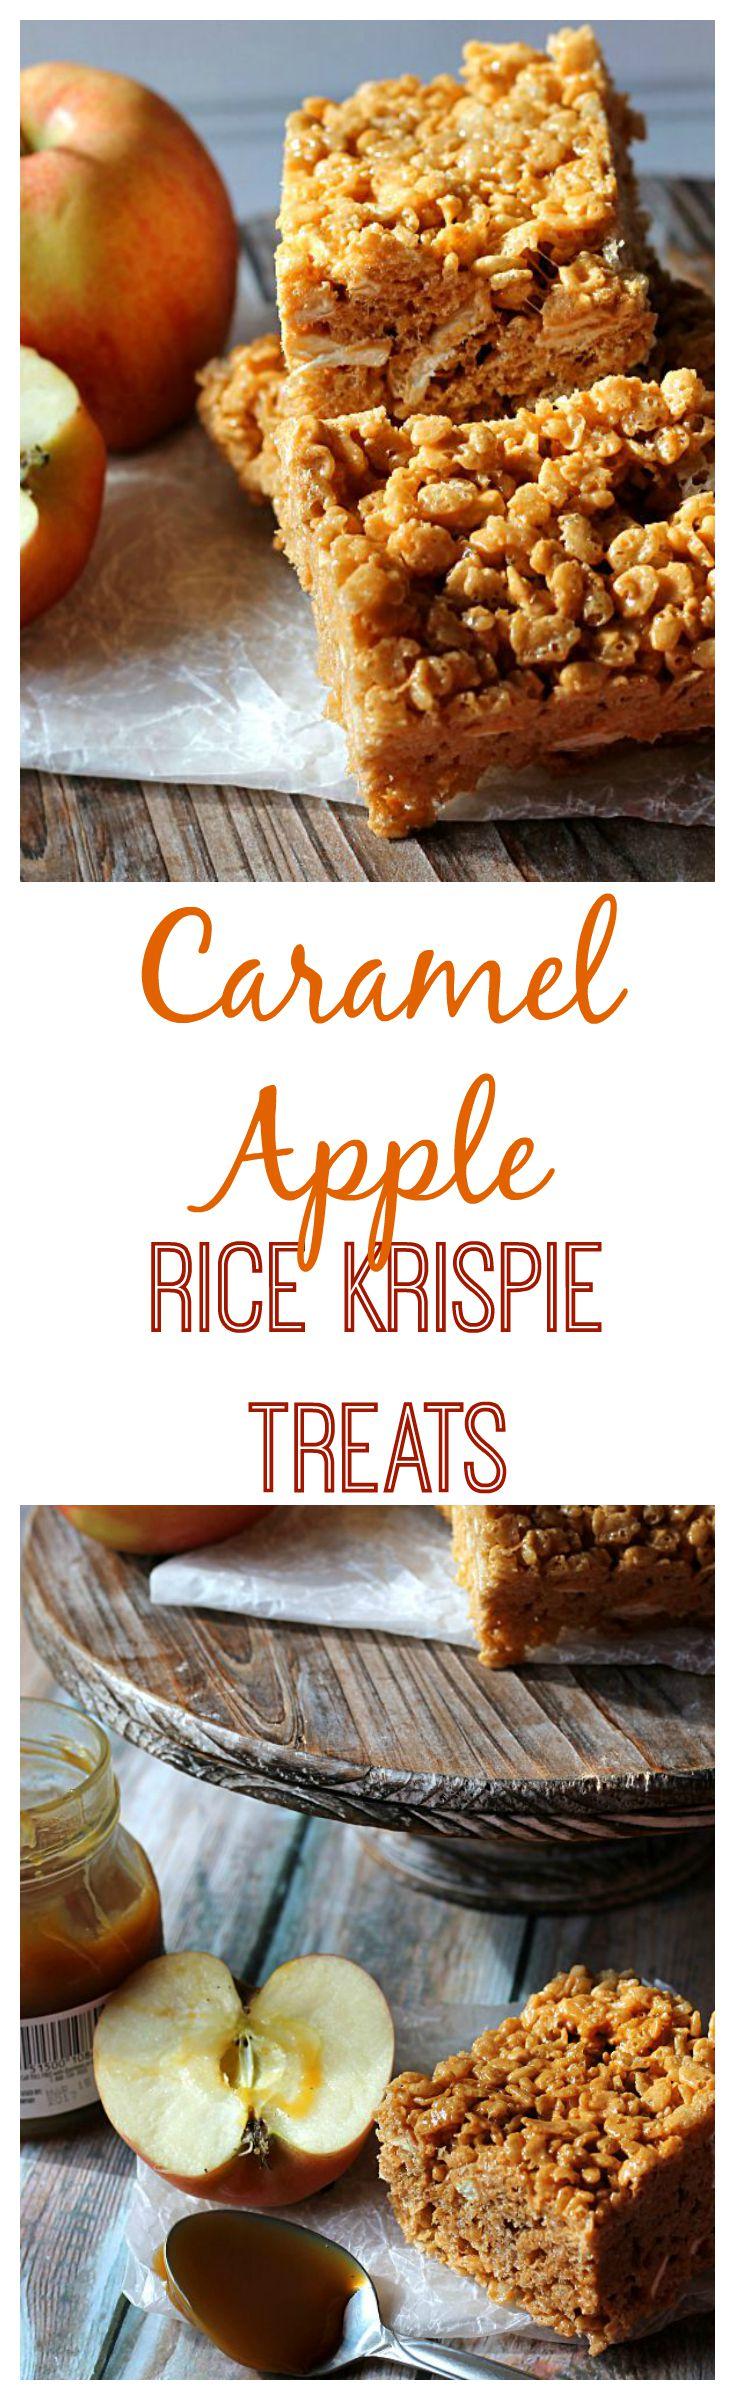 Caramel Apple Rice Krispie Treats